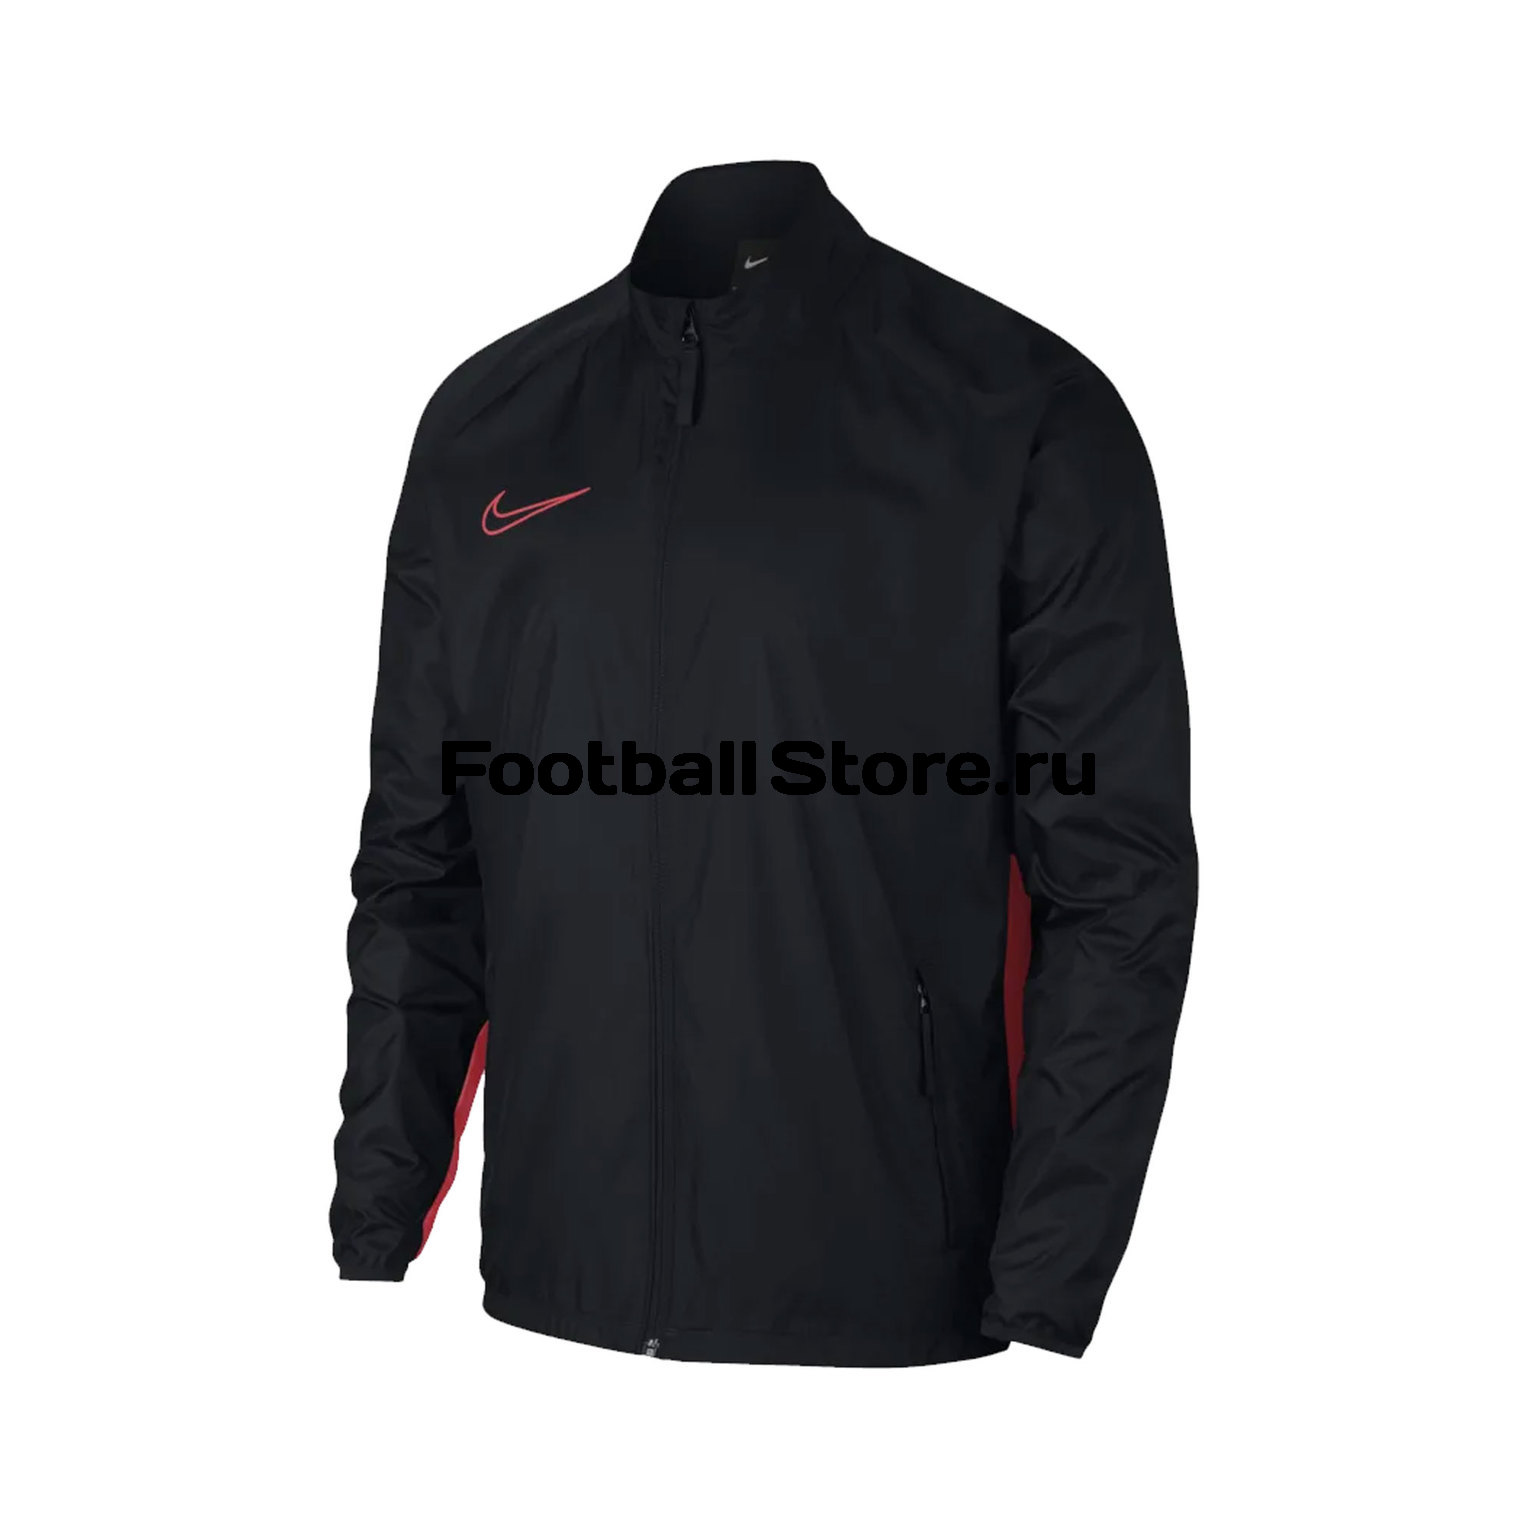 Куртка Nike Dry Academy AJ9702-011 куртка nike dry team woven 800199 021